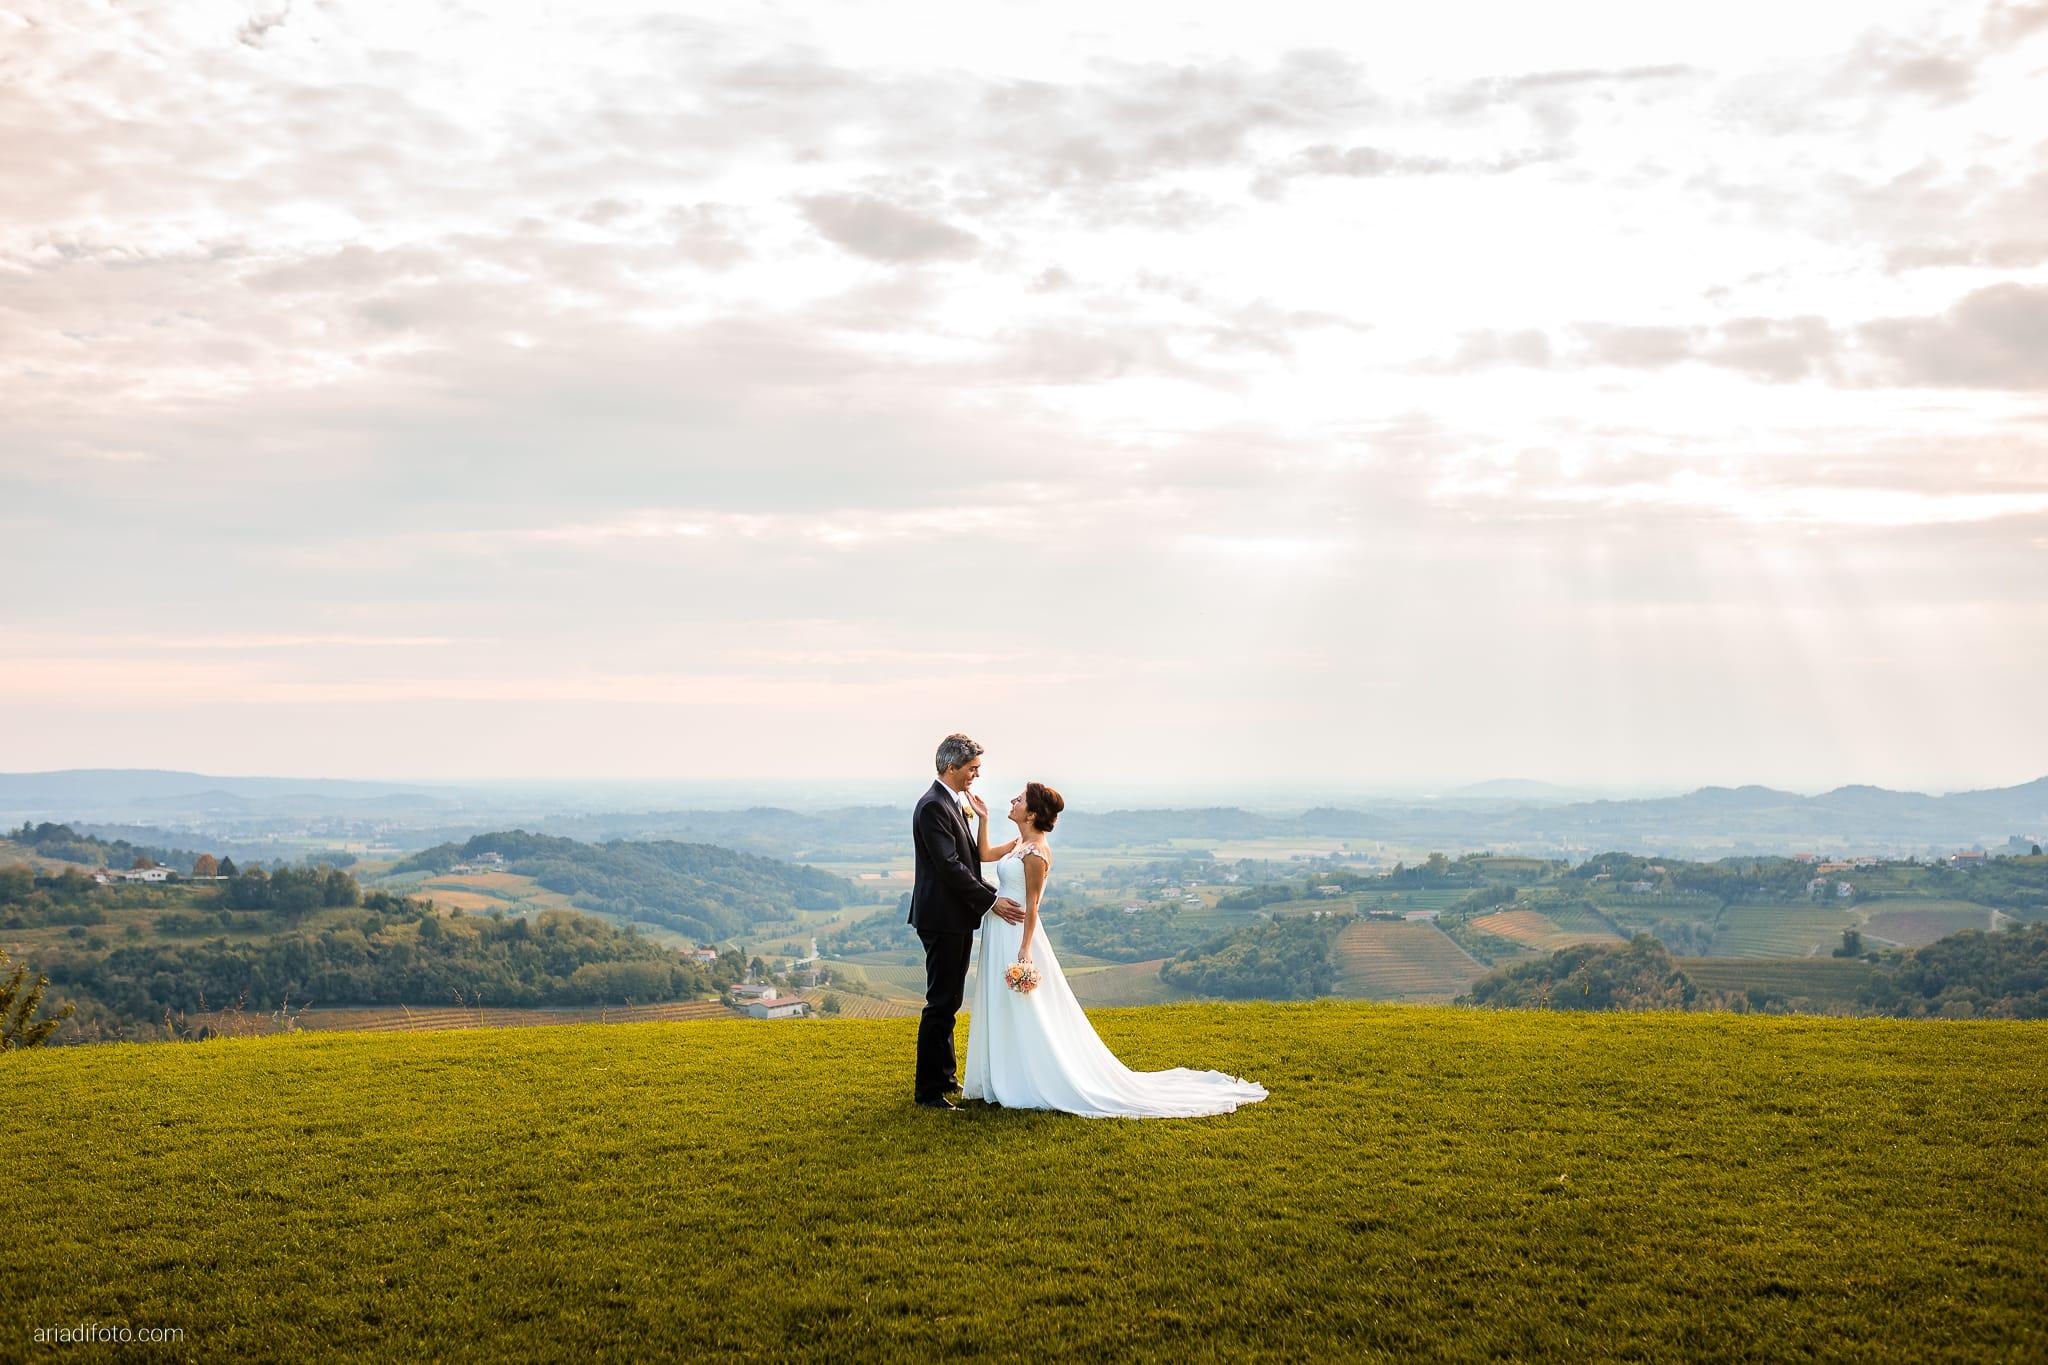 Tatiana Marco Matrimonio Trieste Baronesse Tacco San Floriano Collio Gorizia ritatti sposi